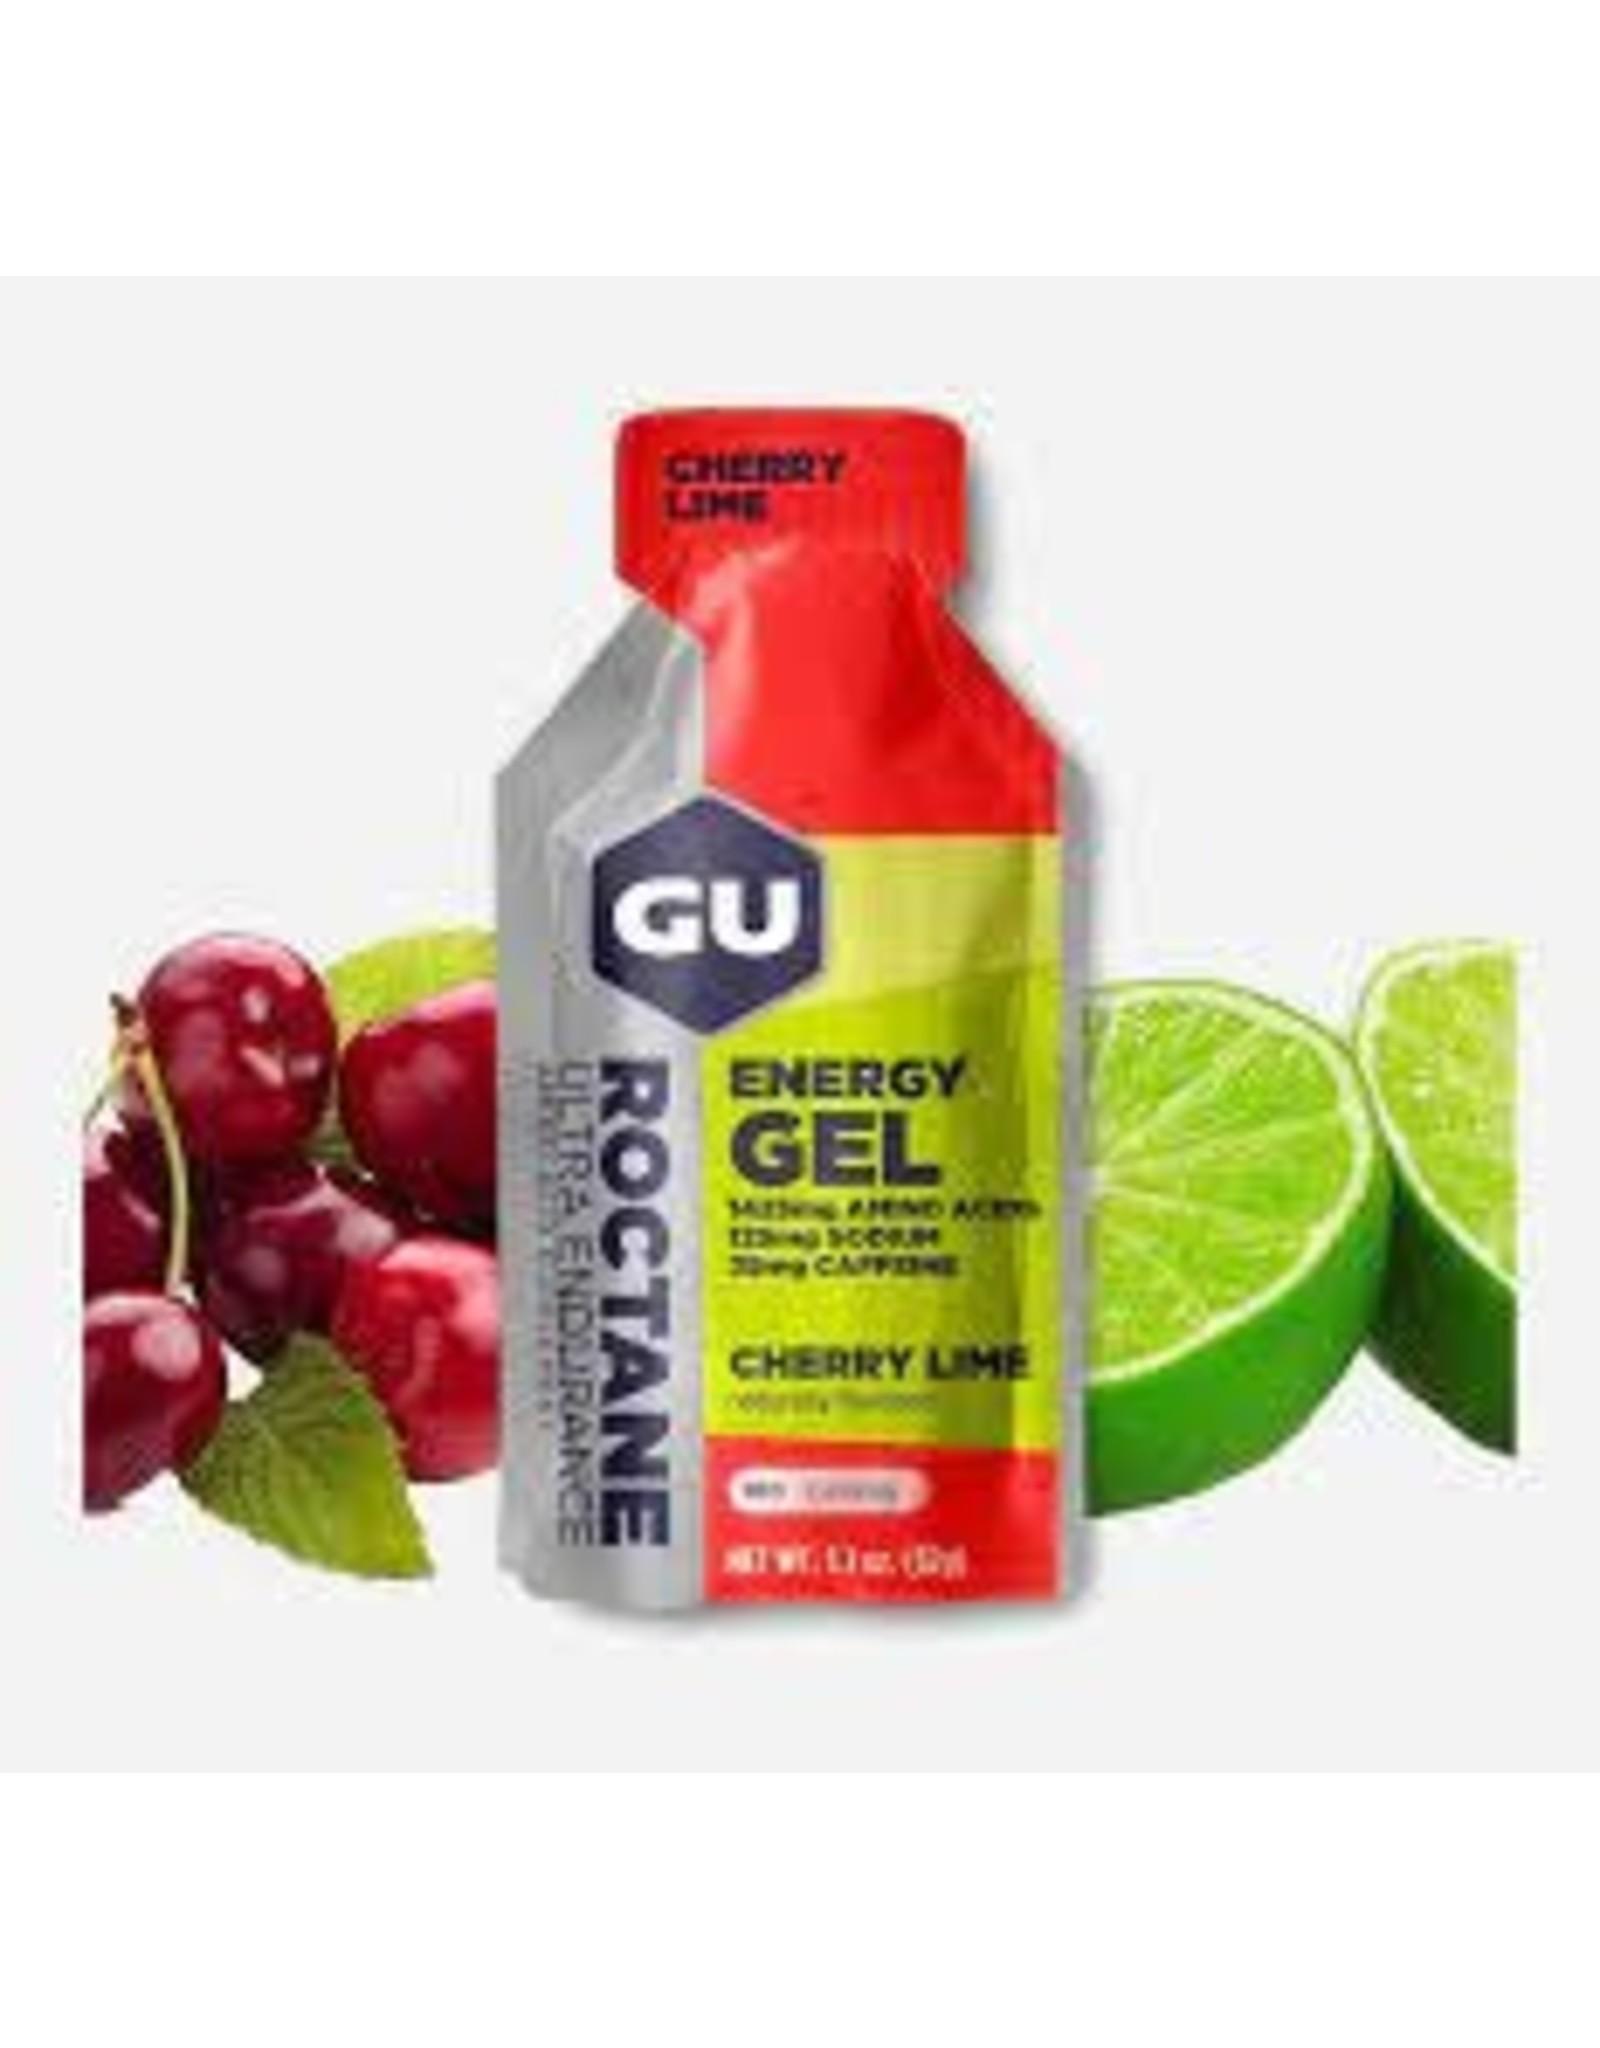 GU Energy Labs GU Roctane Cherry Lime Box of 24 single